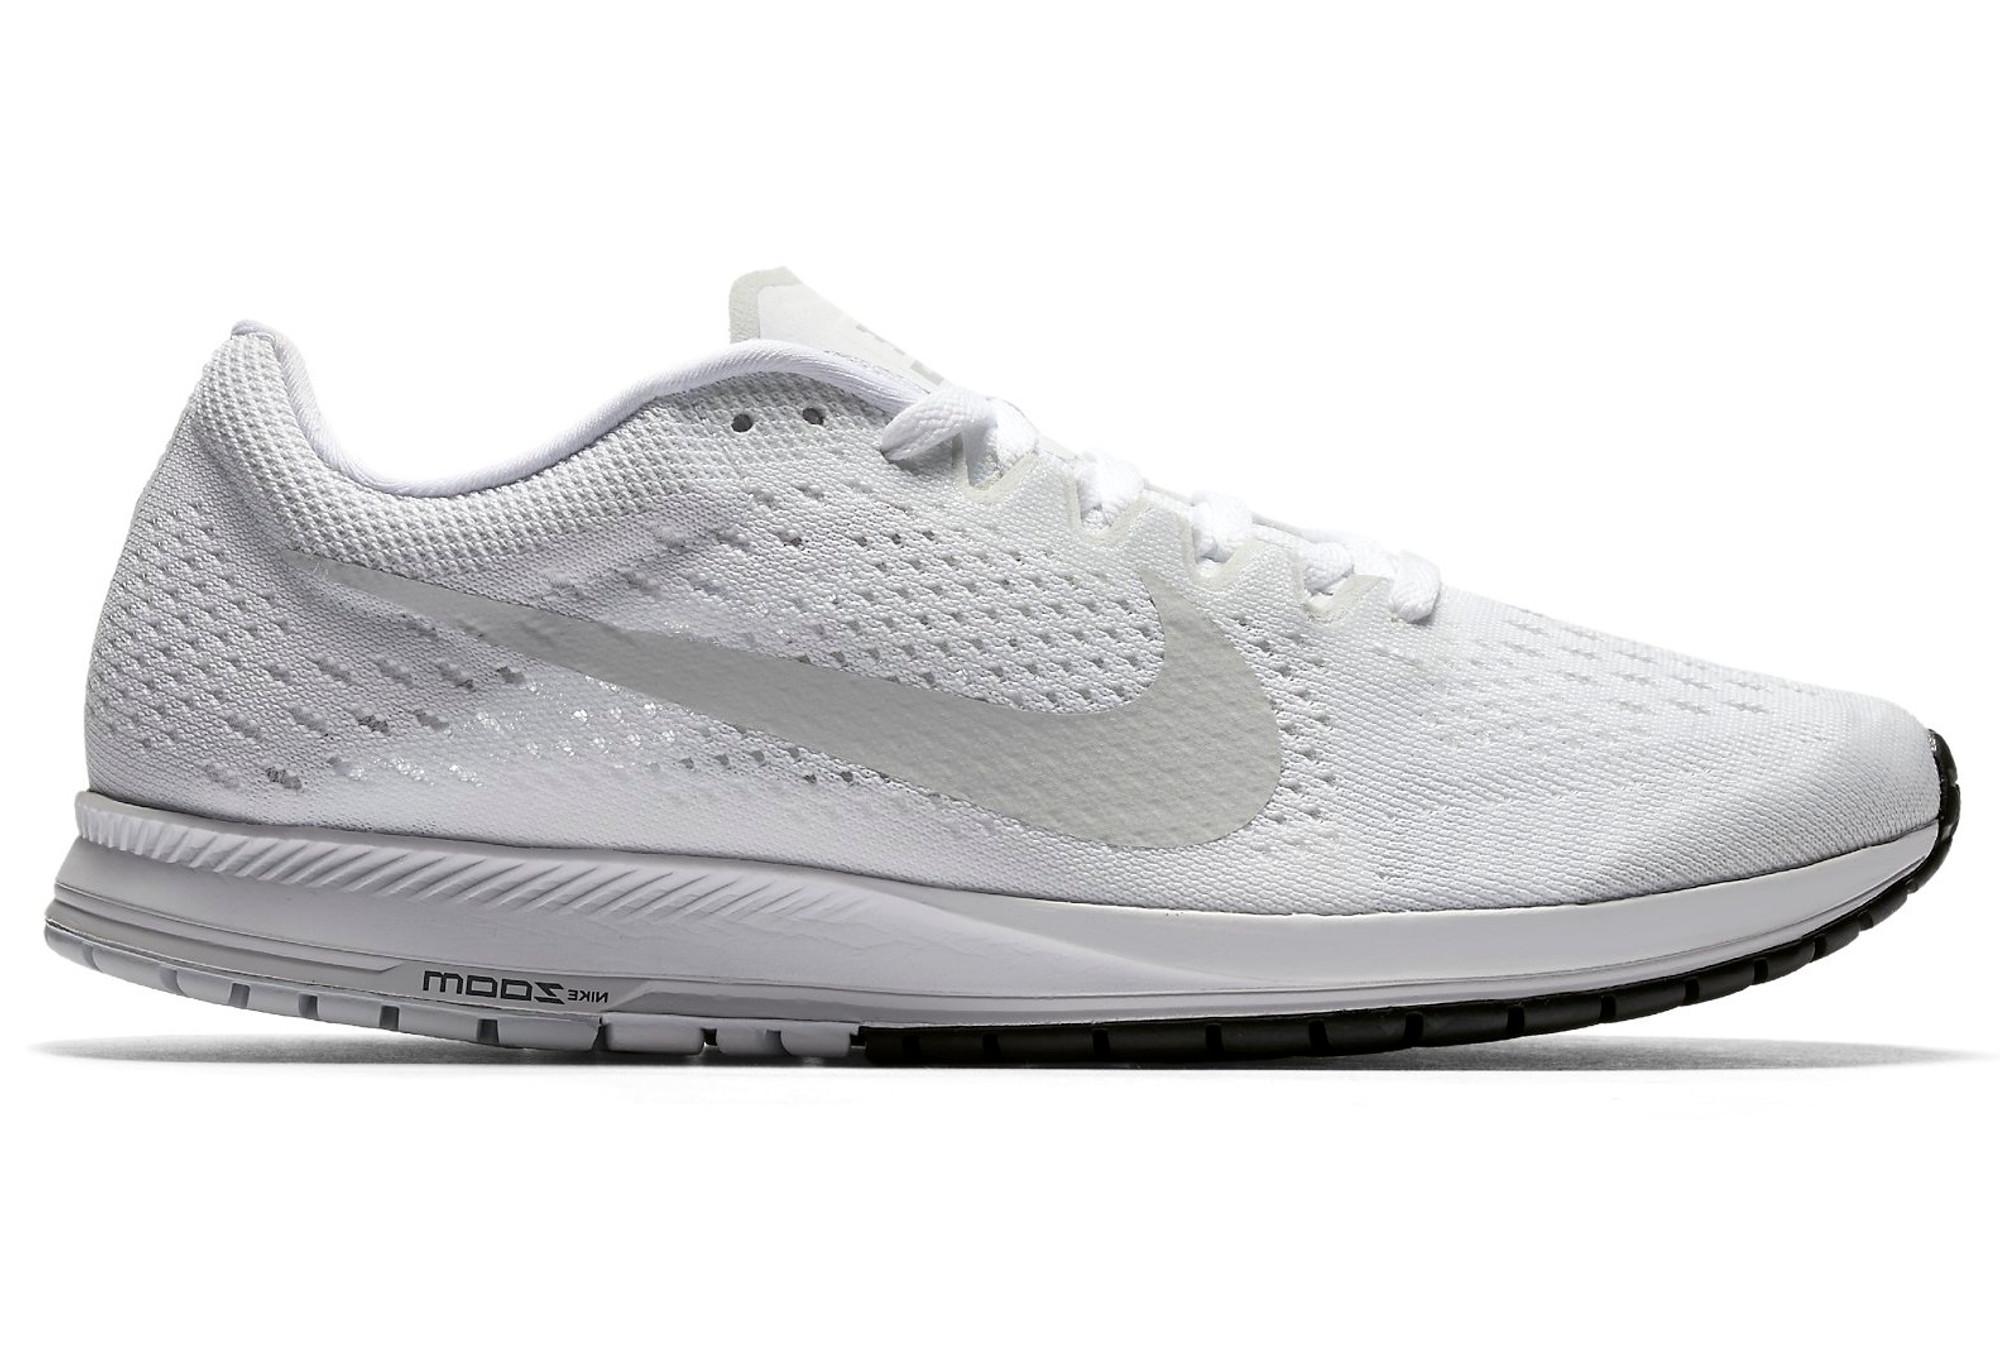 8bc2306c0b31 Nike Air Zoom Streak 6 White Unisex